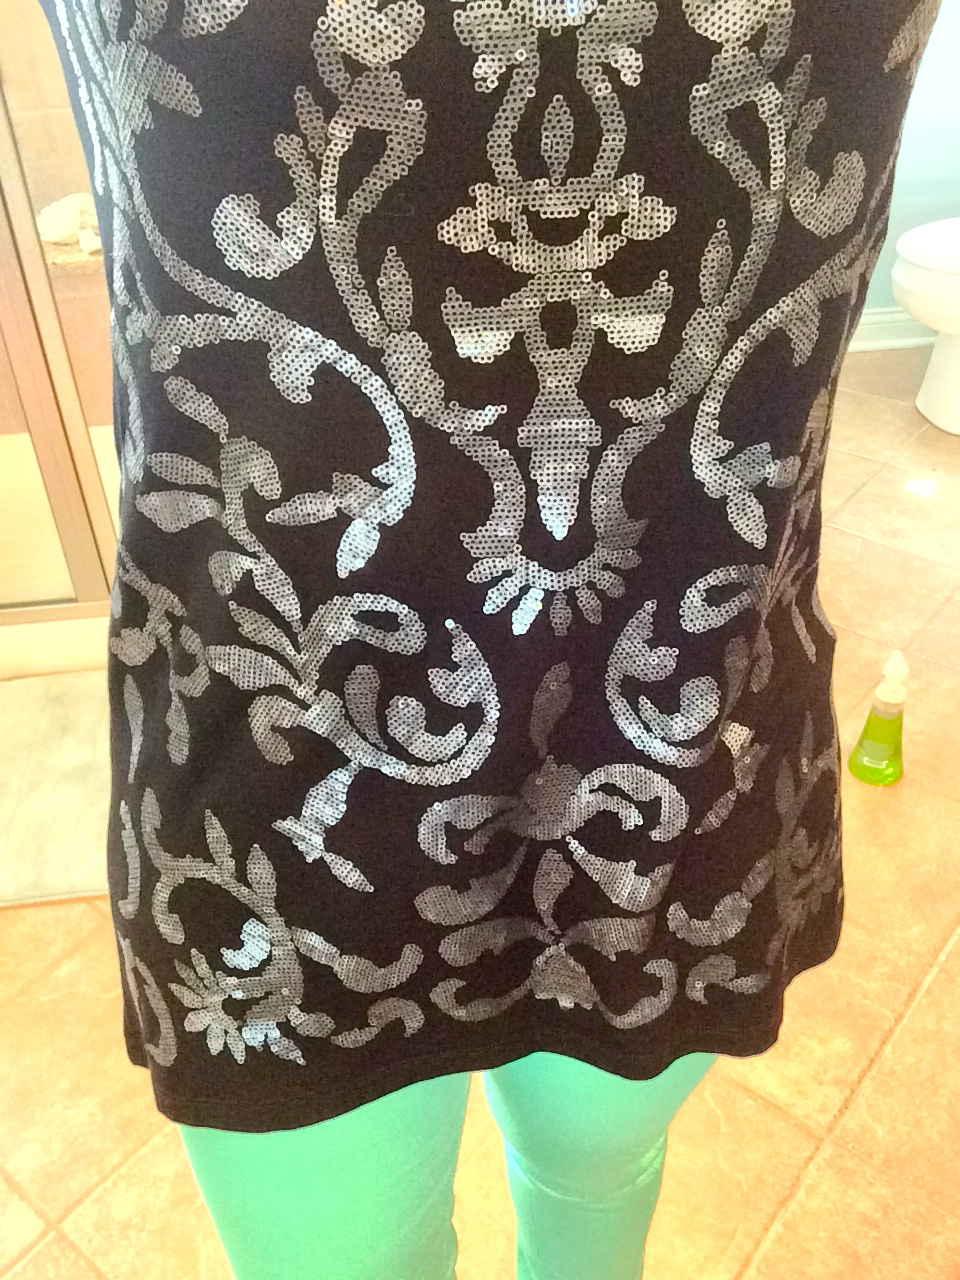 Martini devin lace detail maxi dress